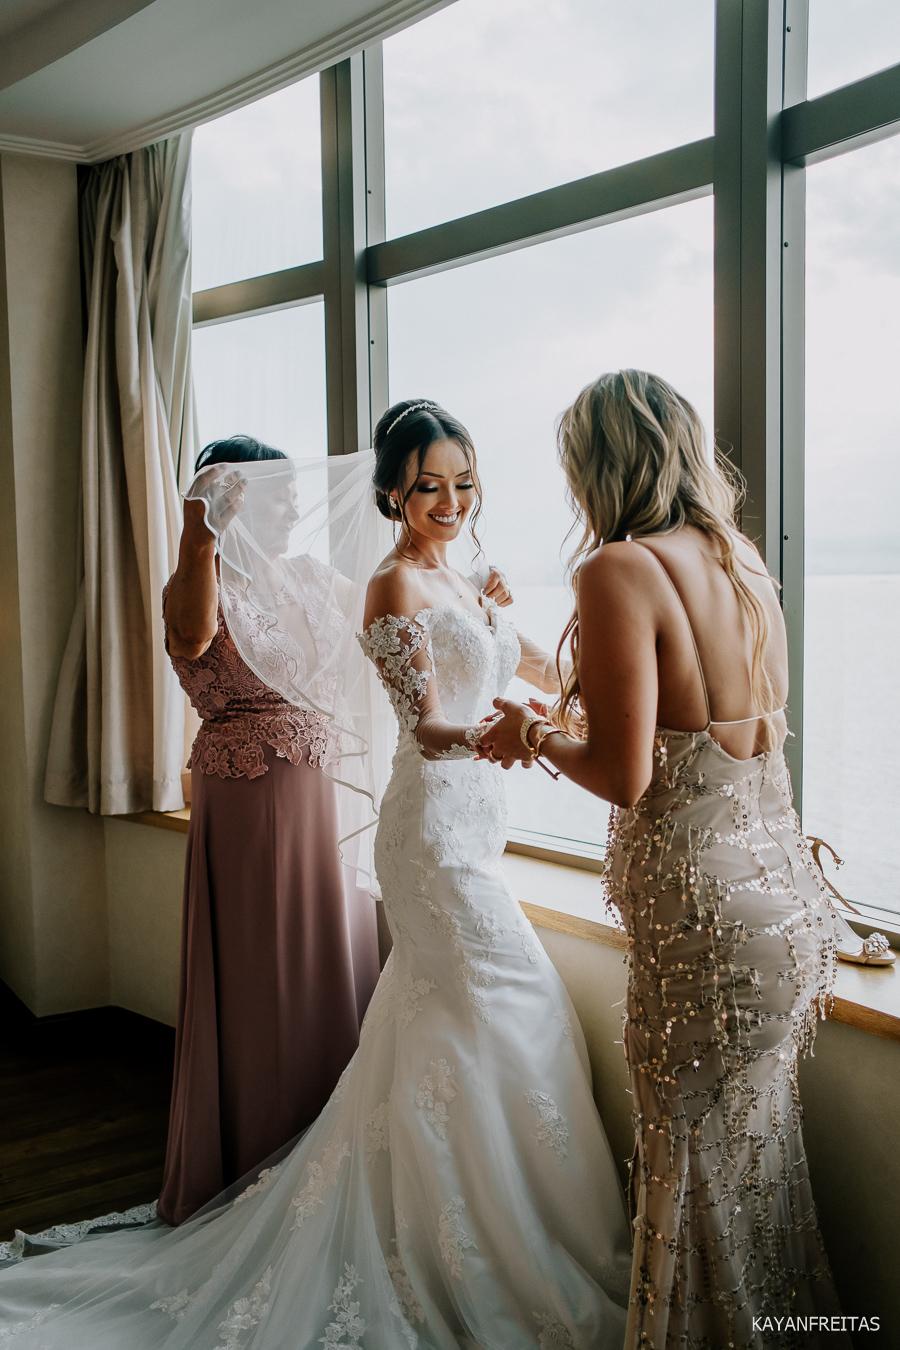 casamento-indaia-floripa-0021 Casamento Indaiá Florianópolis - Deise e Dário